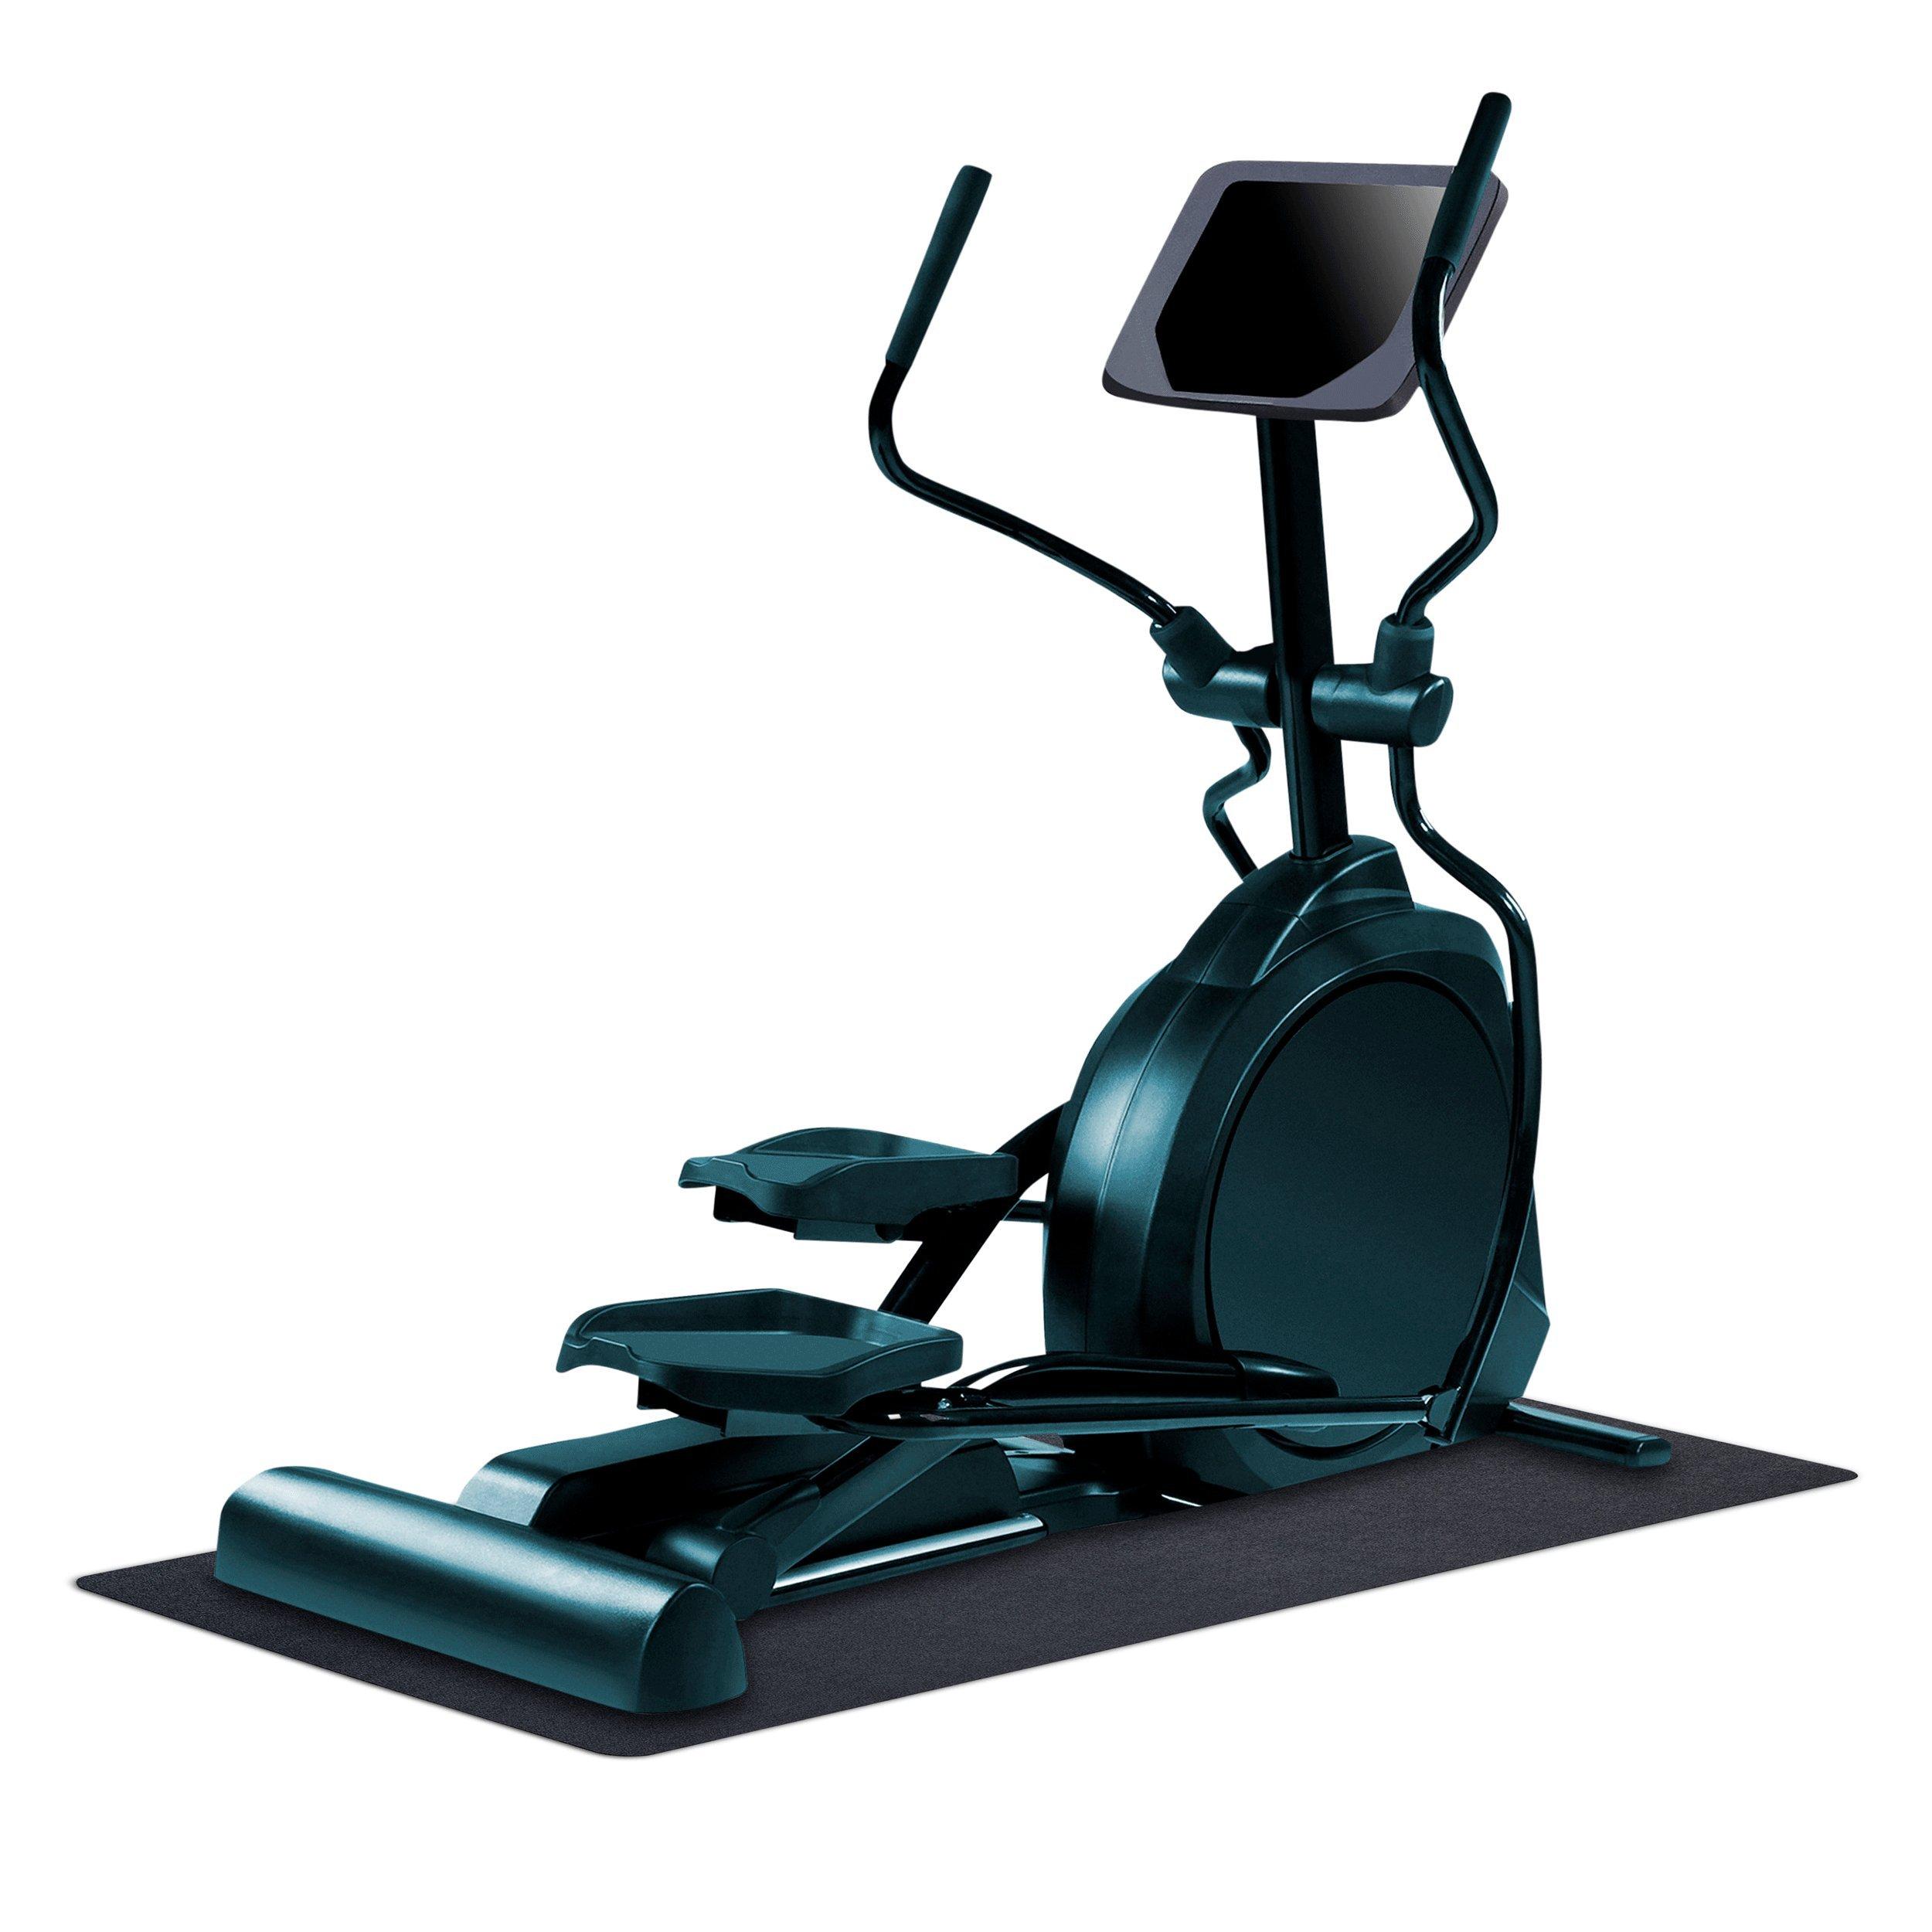 MotionTex 8M-110-30C-5.5 Fitness Equipment Mat, 30'' x 66'', Black